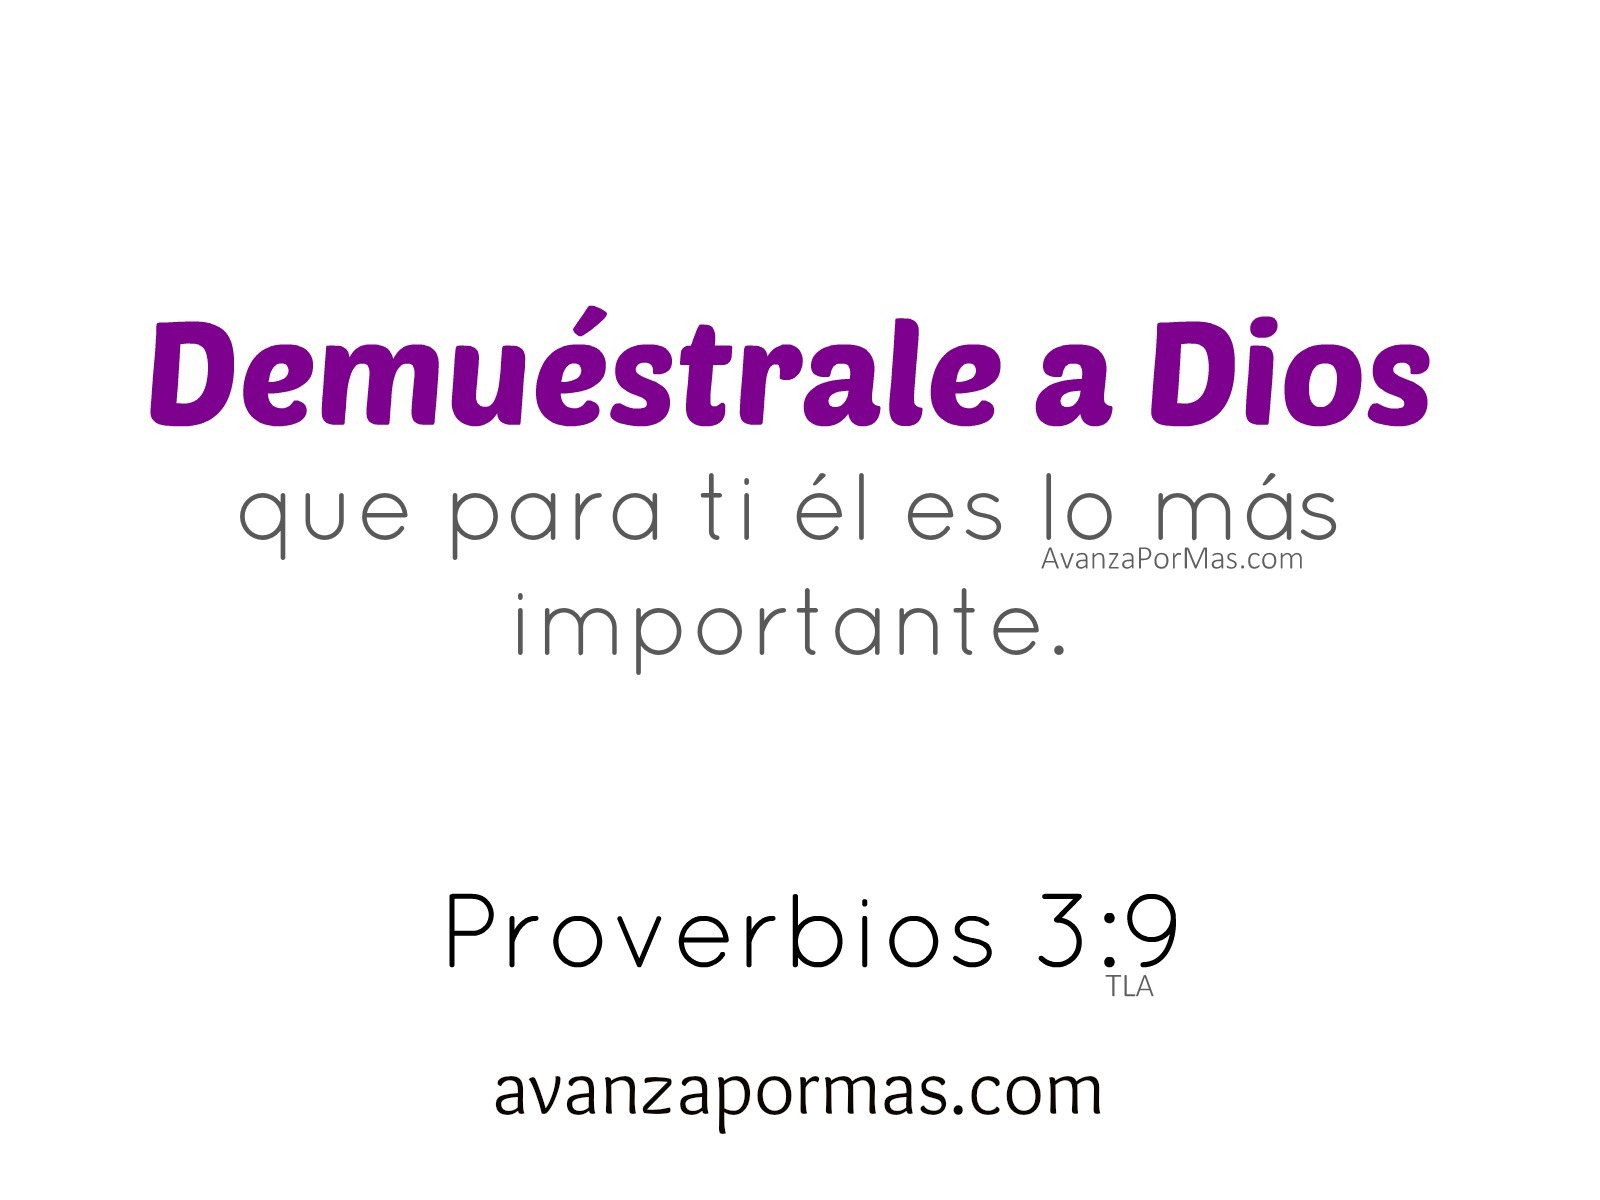 proverbios 6